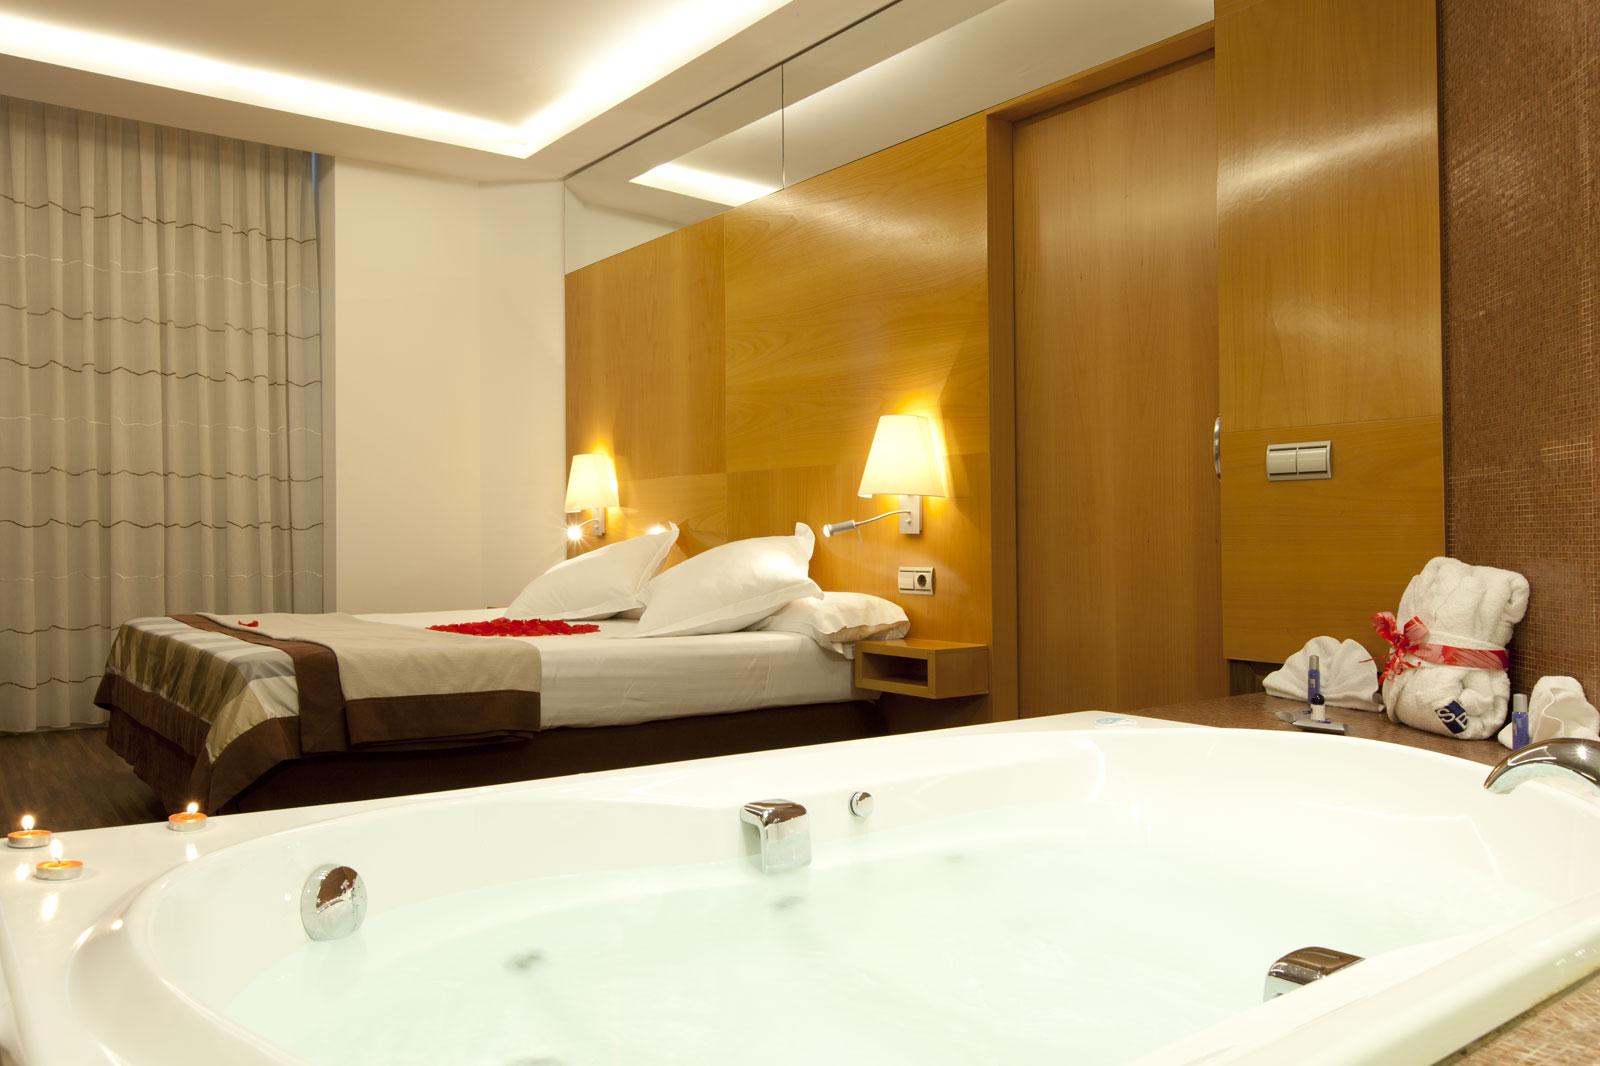 Hotel de luxe a barcelone avec jacuzzi for Chambre avec jacuzzi barcelone